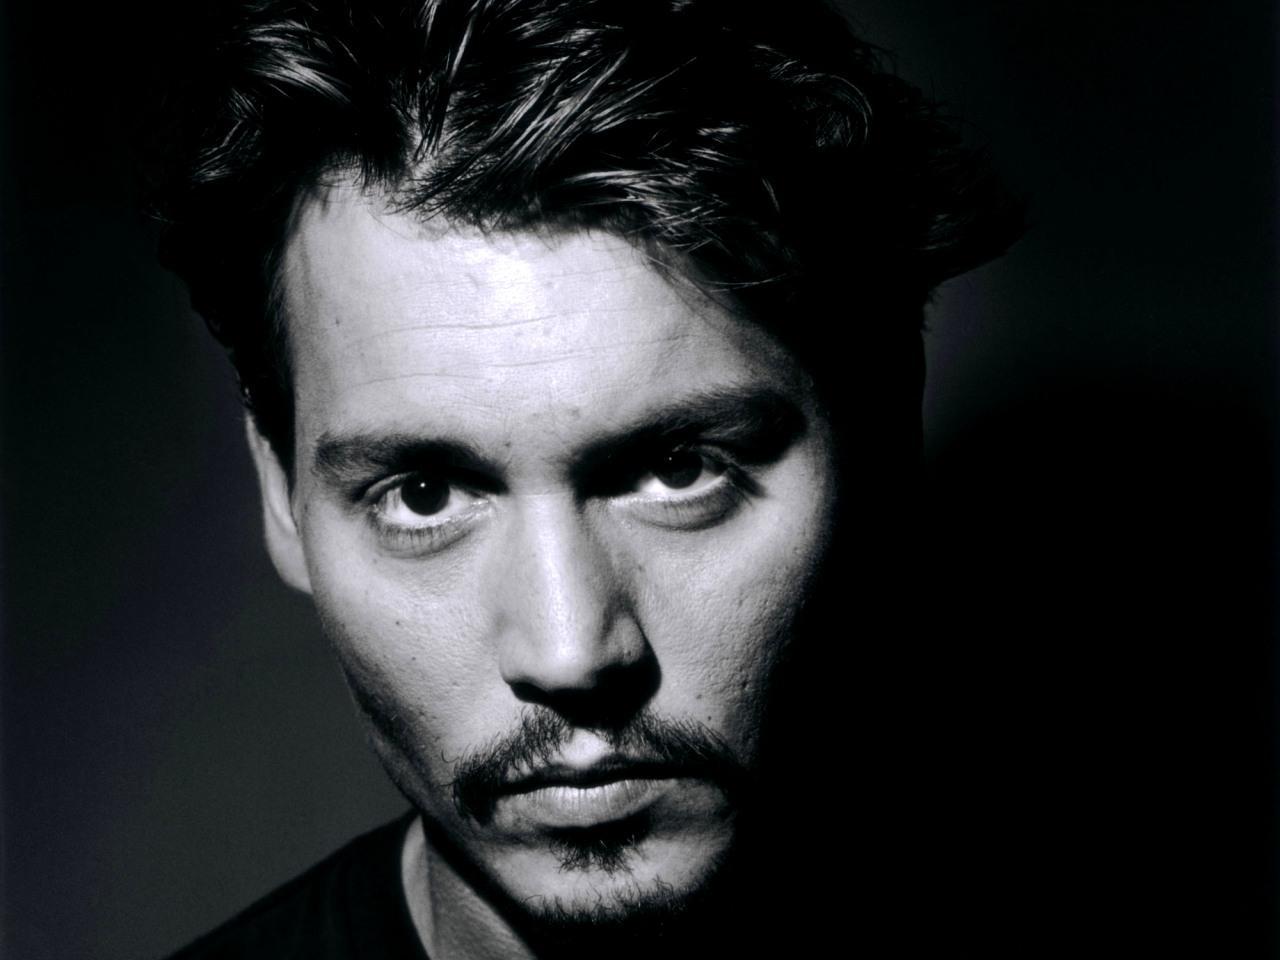 [48+] Young Johnny Depp Wallpaper On WallpaperSafari